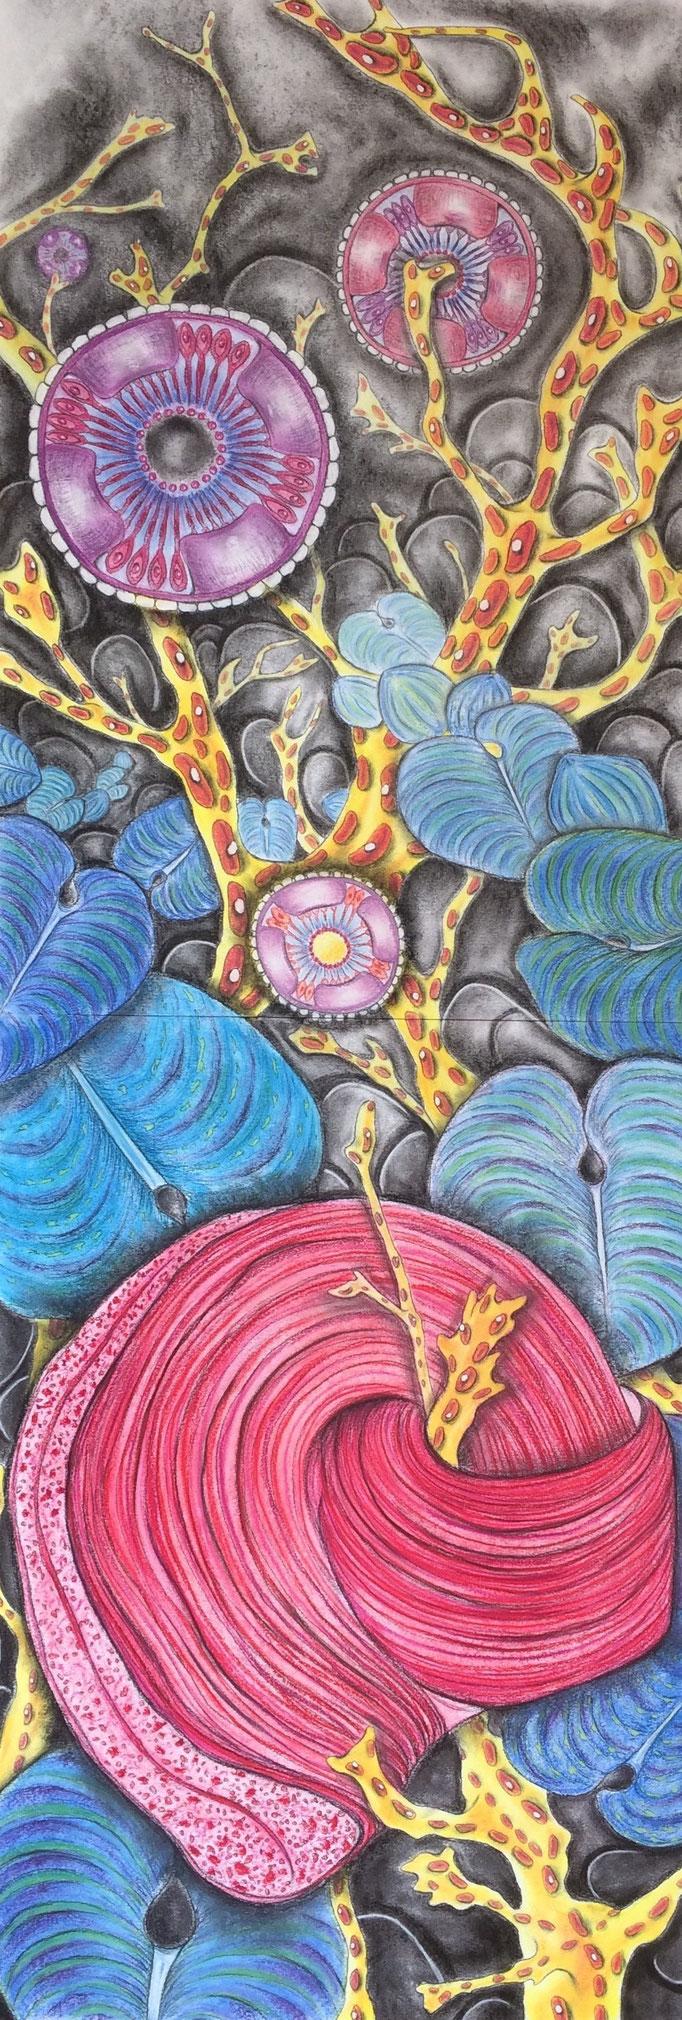 Watergeheimen IV, 2020 | 140x50cm | Pastel, houtskool, Siberisch krijt op papier